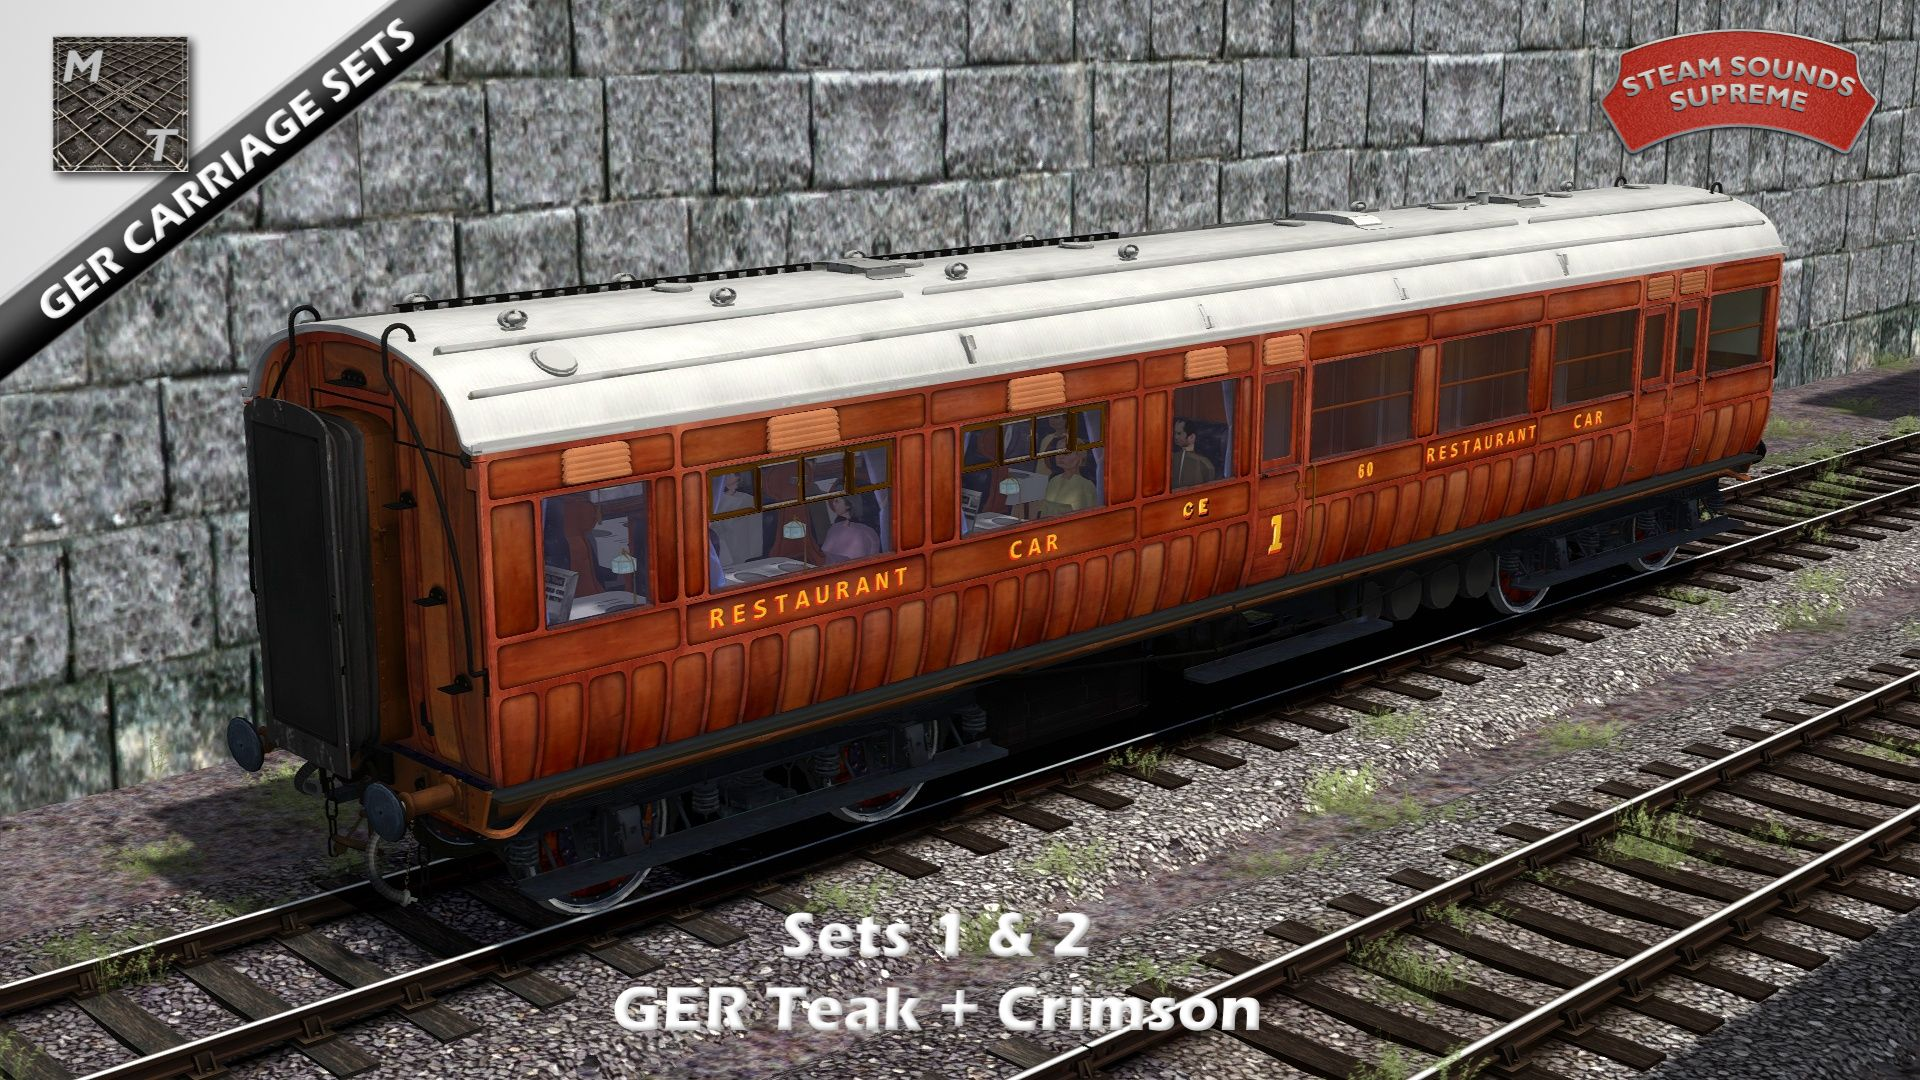 GERCorrSet1-2_07.jpg